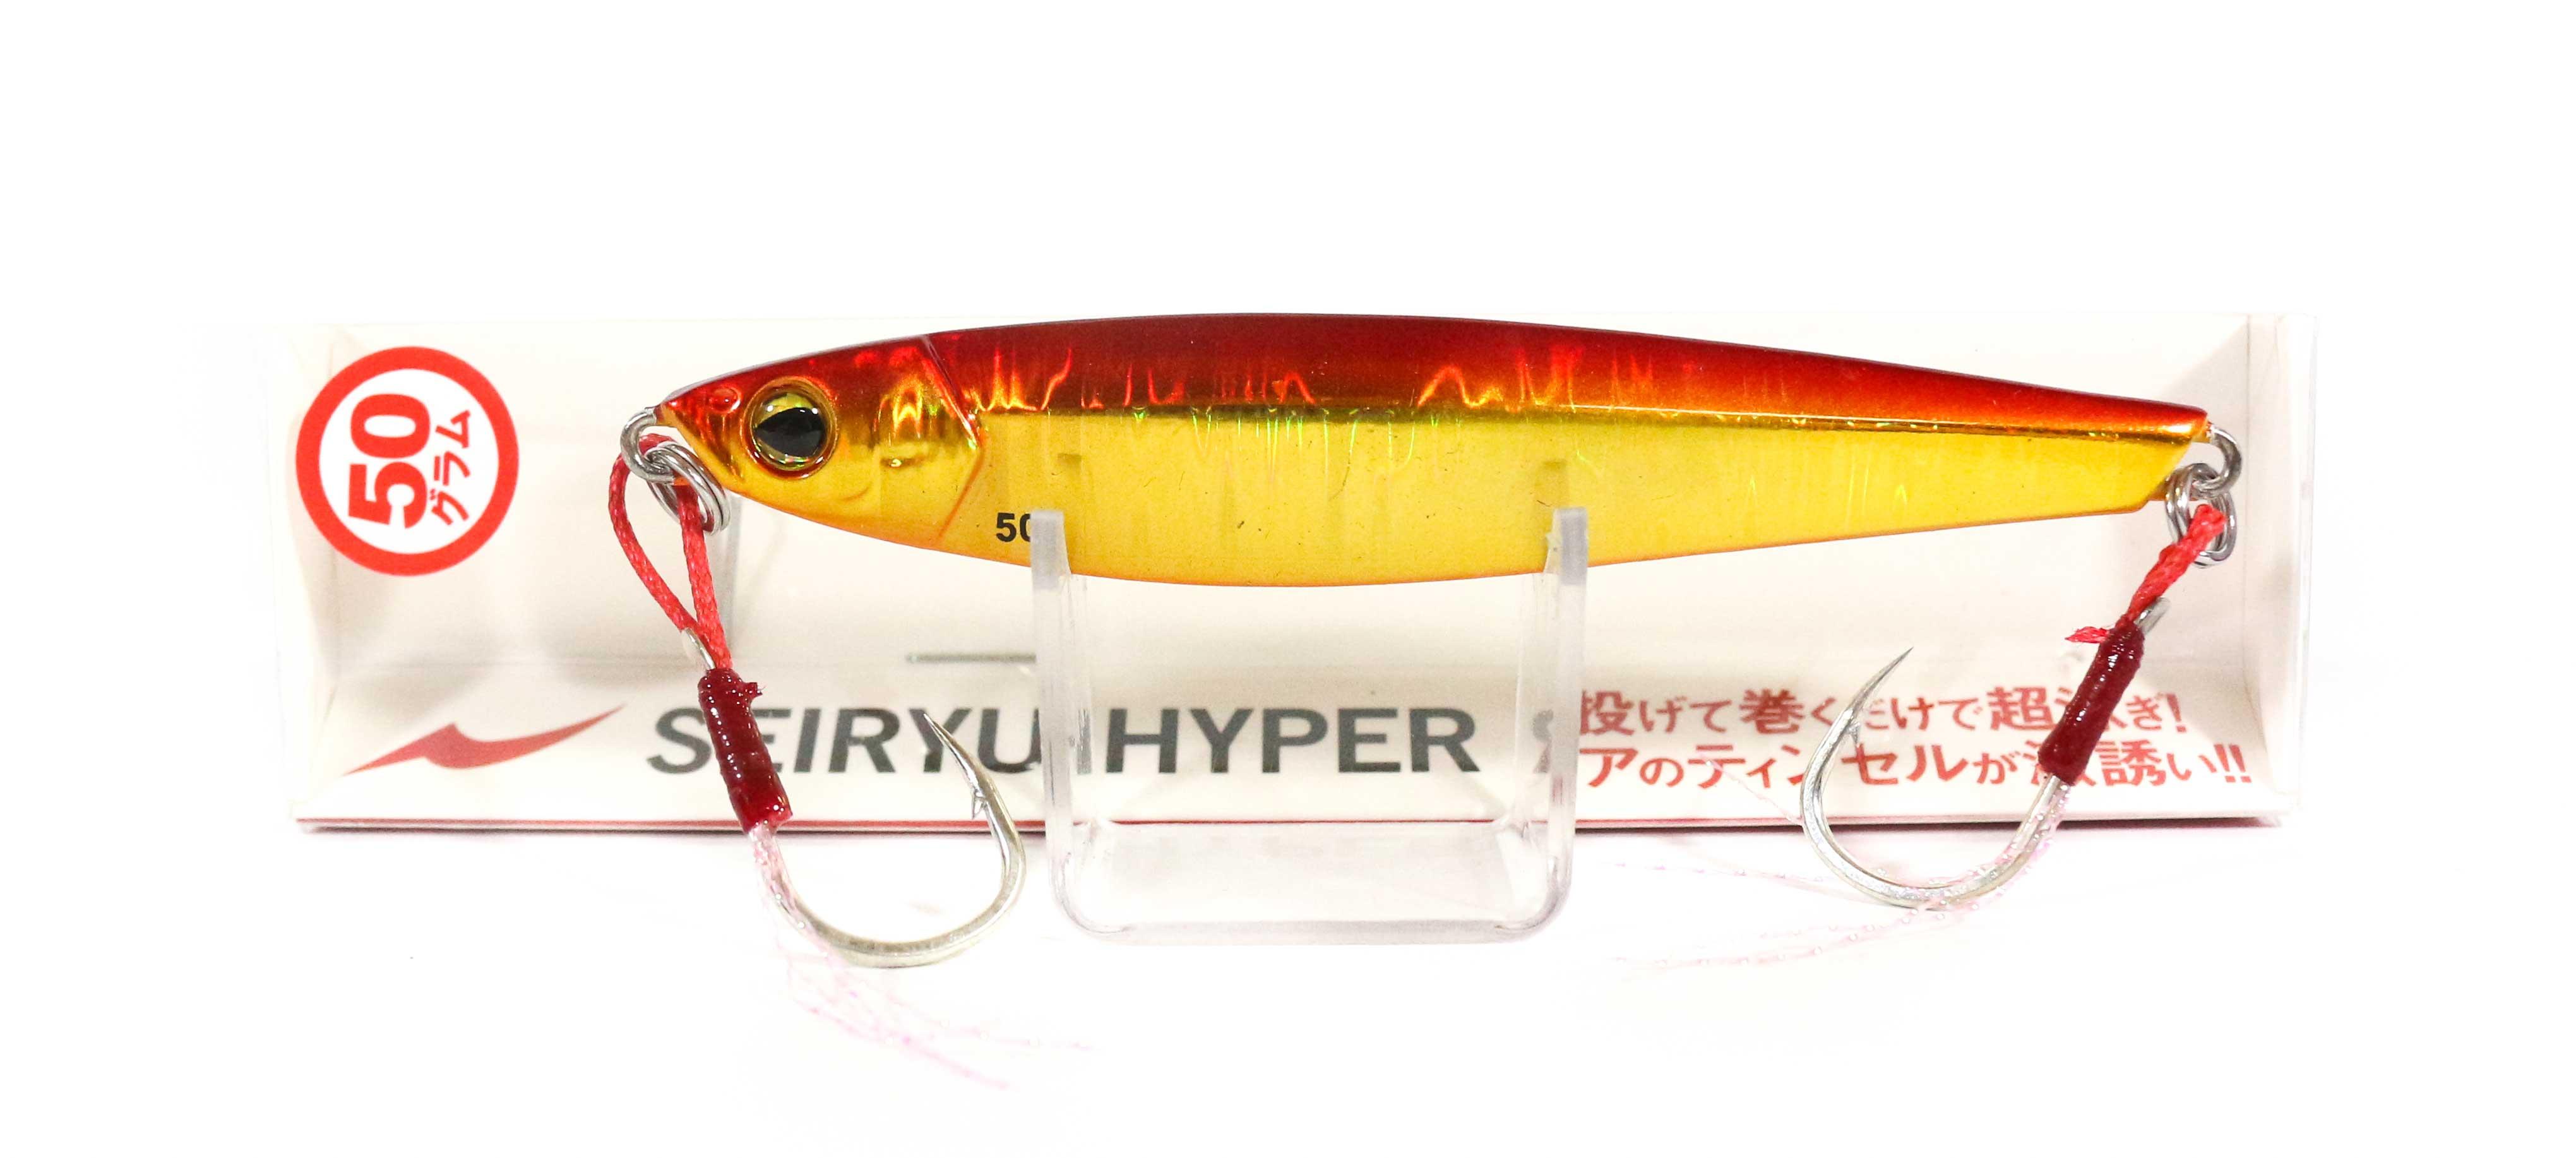 Sale Apia Metal Jig Seiryu Hyper 50 grams 05 (2748)